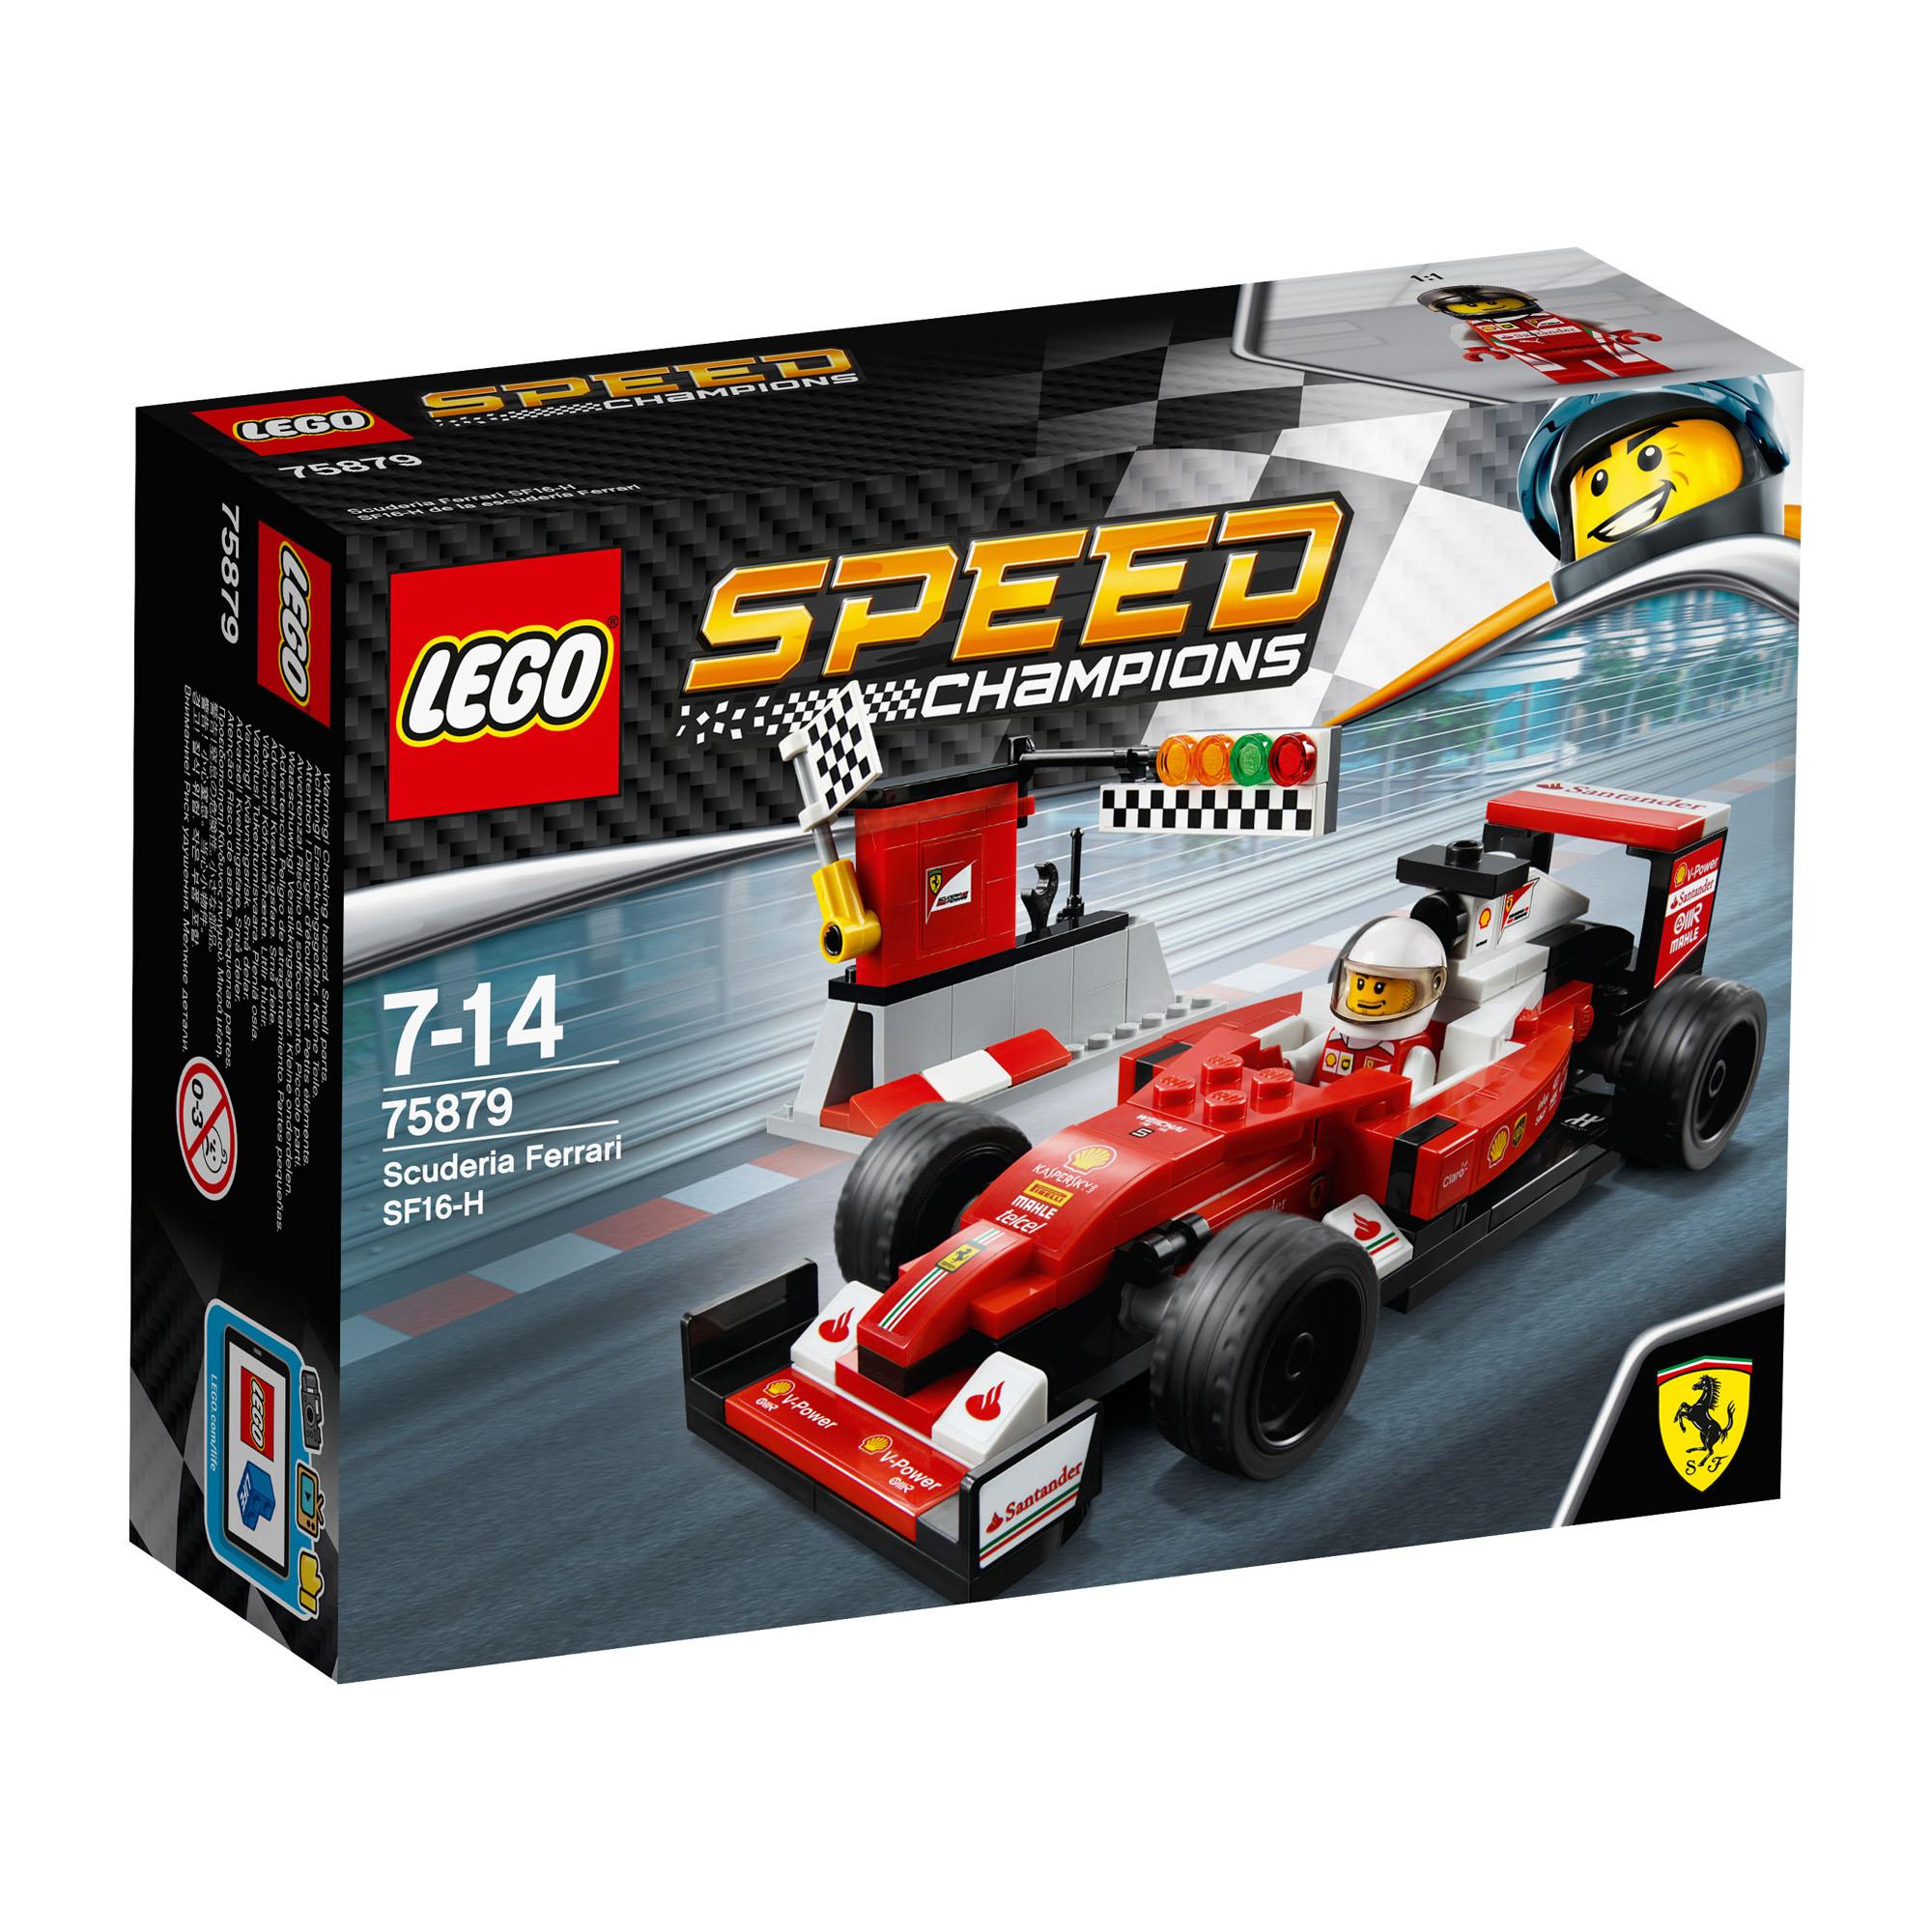 75879 Lego Speed Champions Scuderia Ferrari Sf16 H Formula 1 Car Age